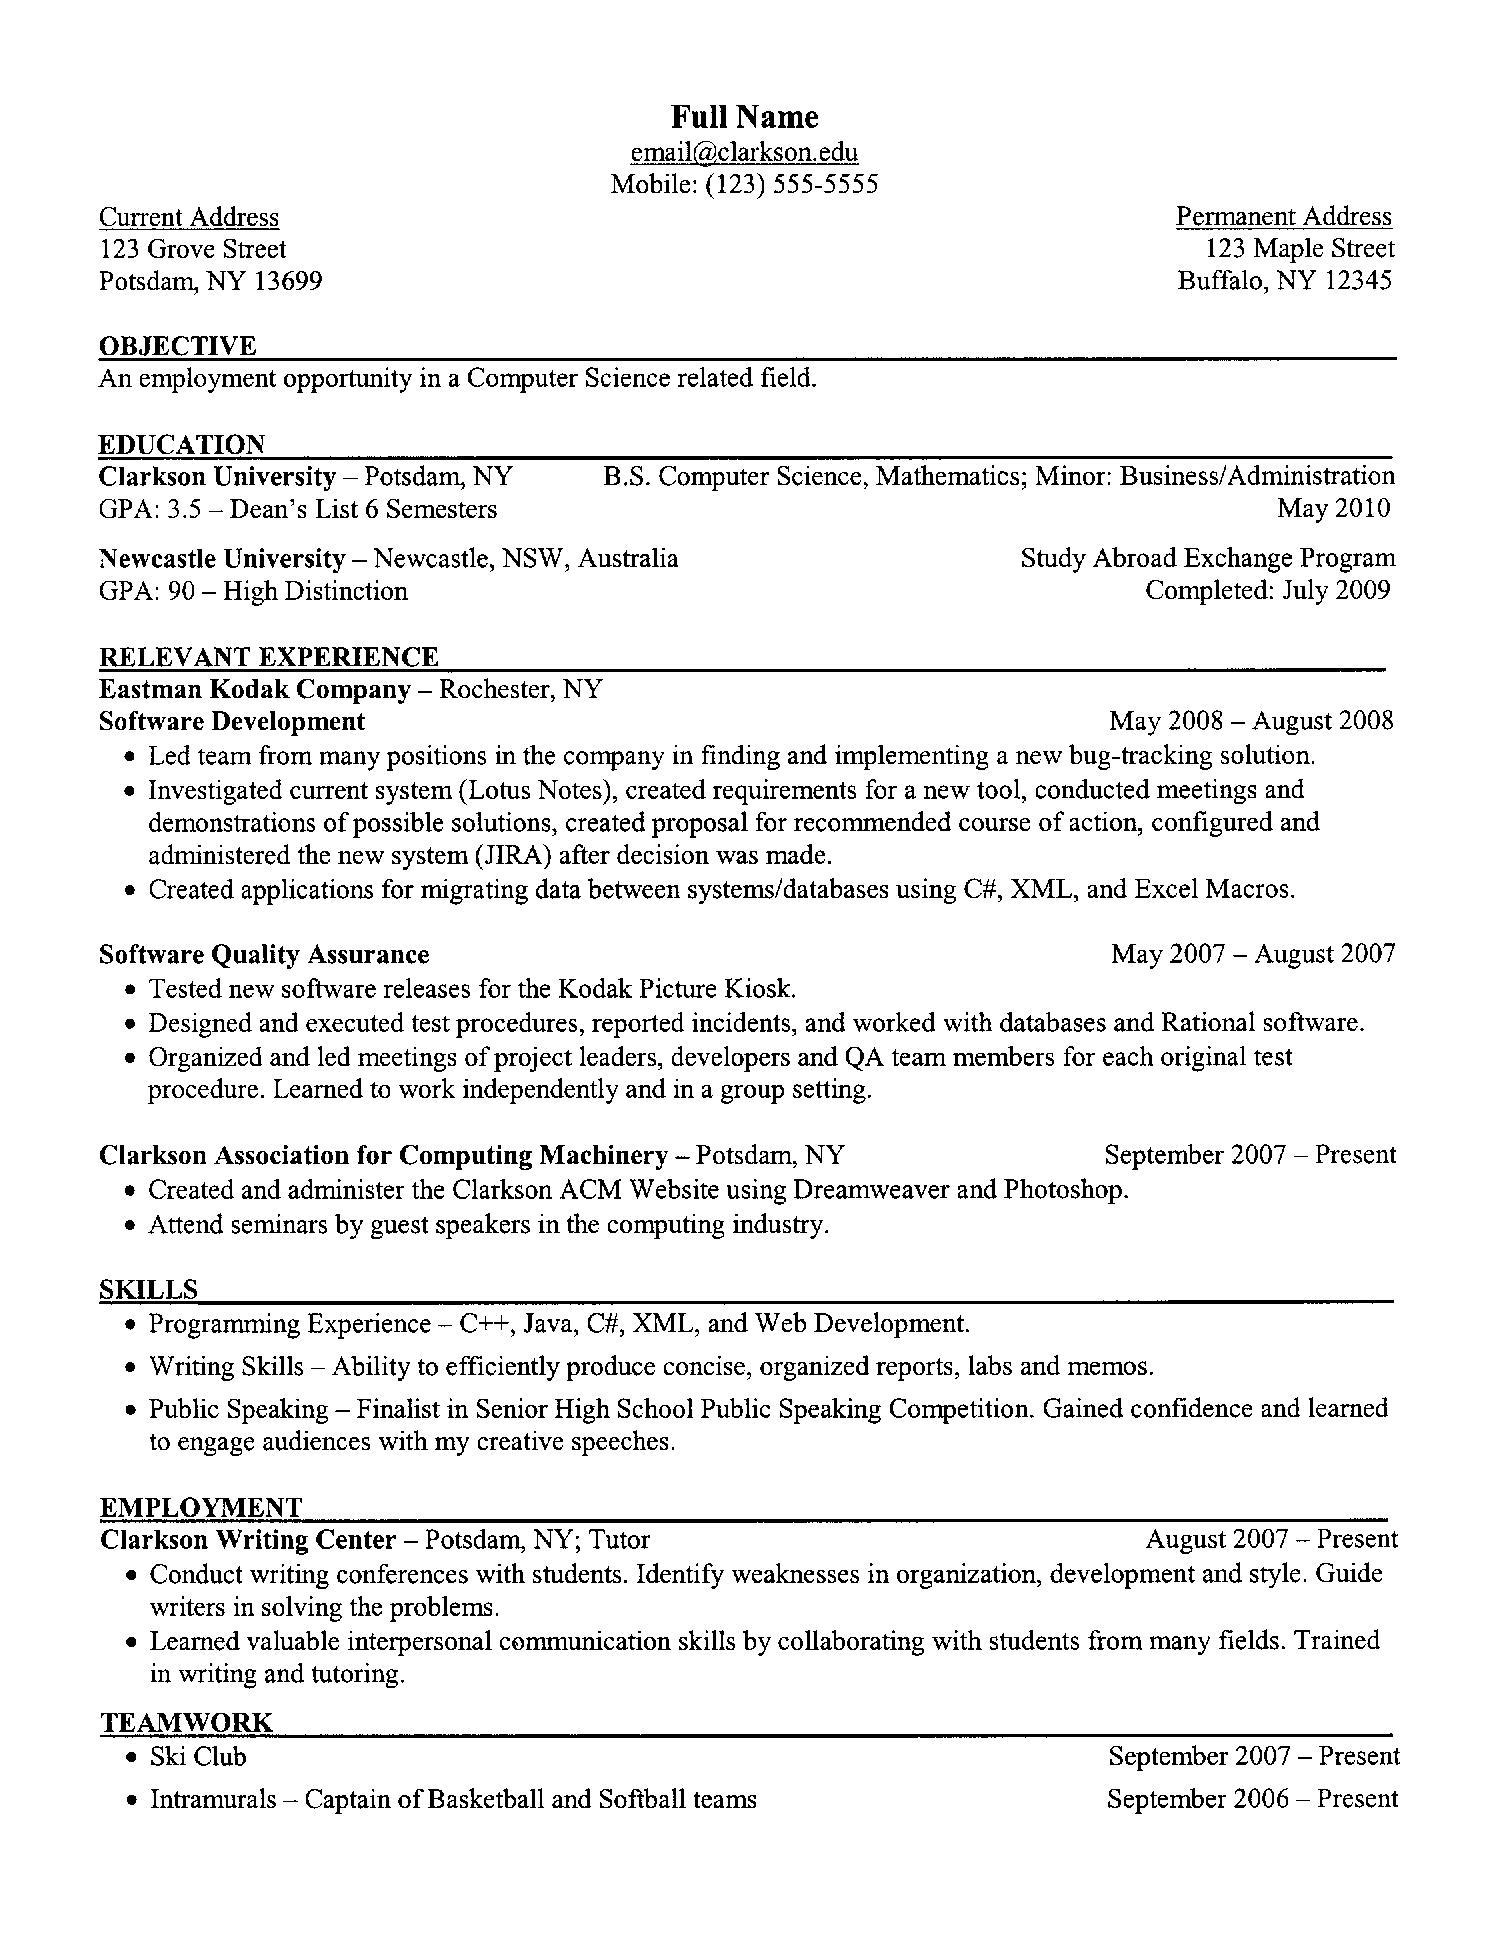 Example of Resume